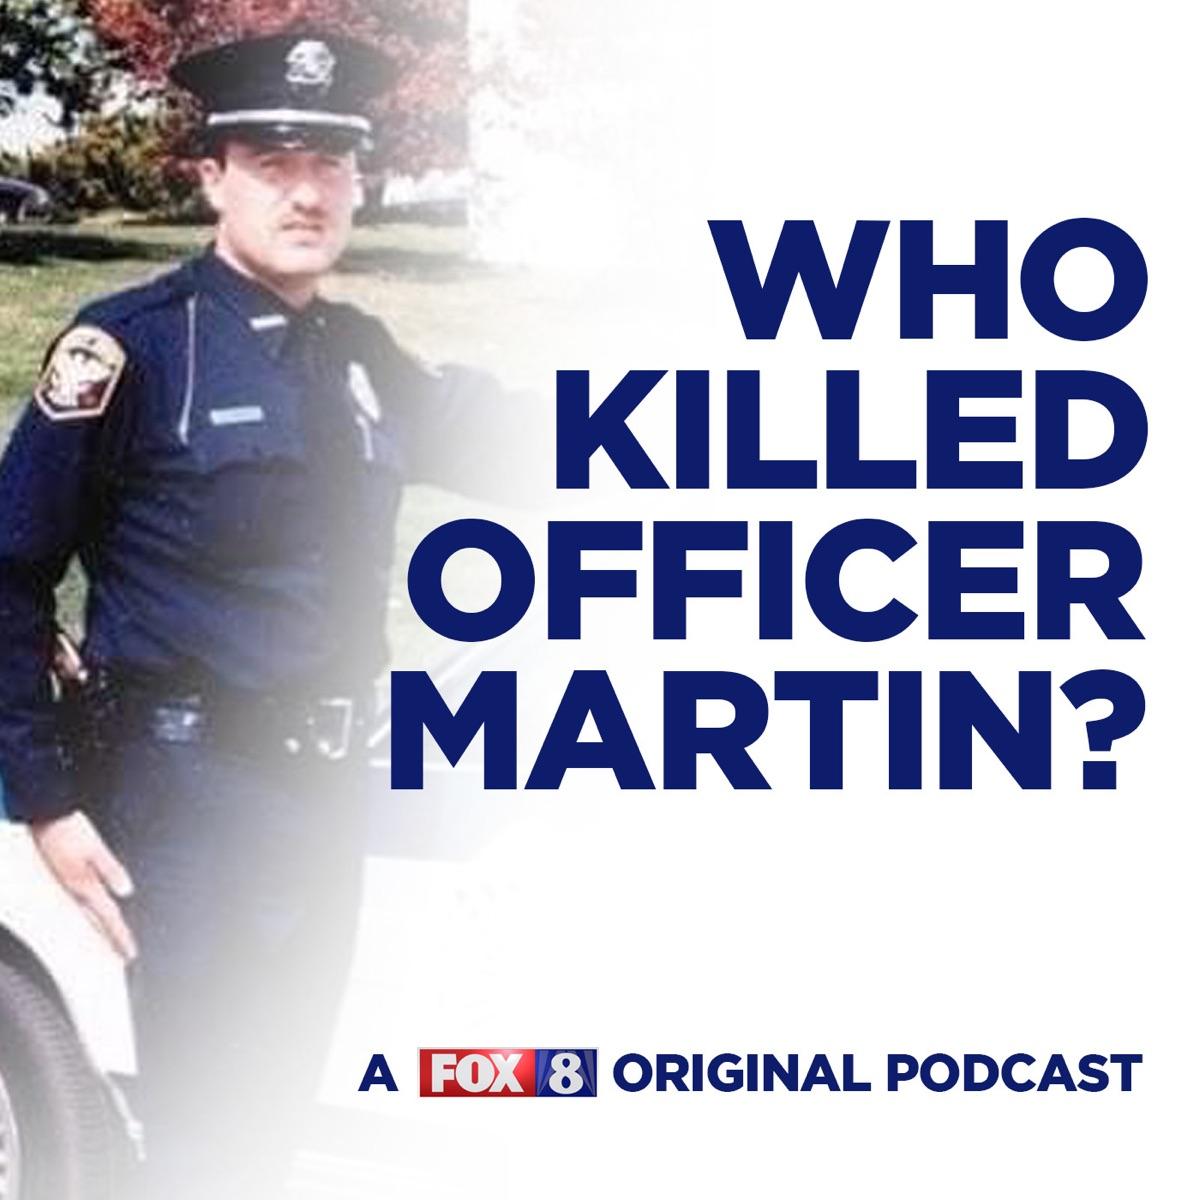 Who Killed Officer Martin